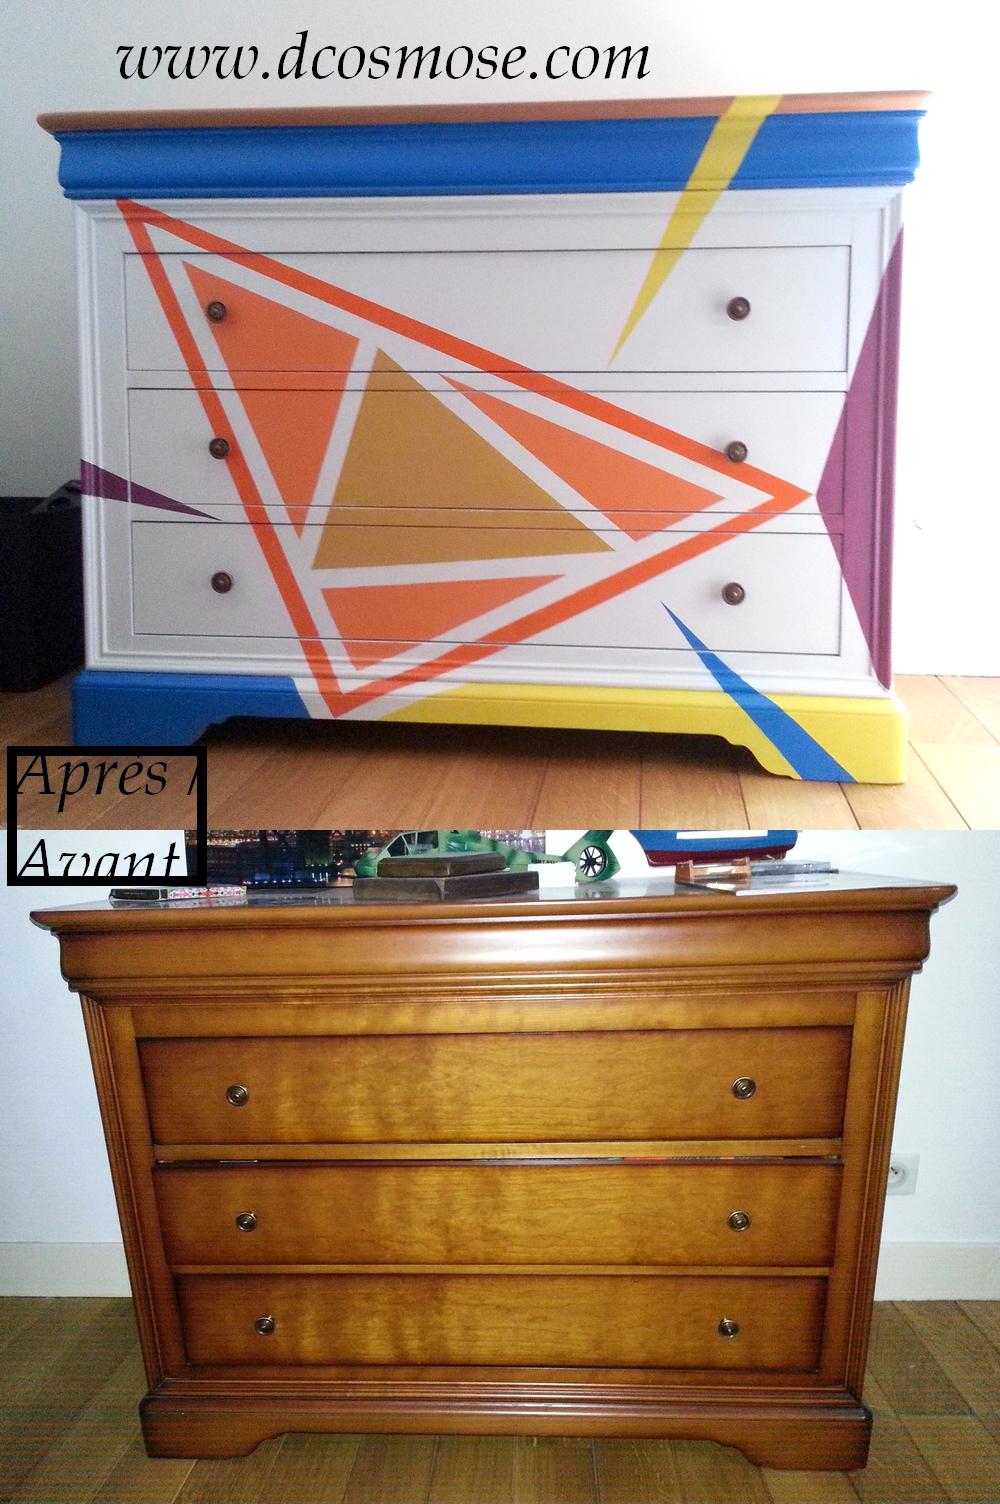 avant apr s d 39 cosmose. Black Bedroom Furniture Sets. Home Design Ideas